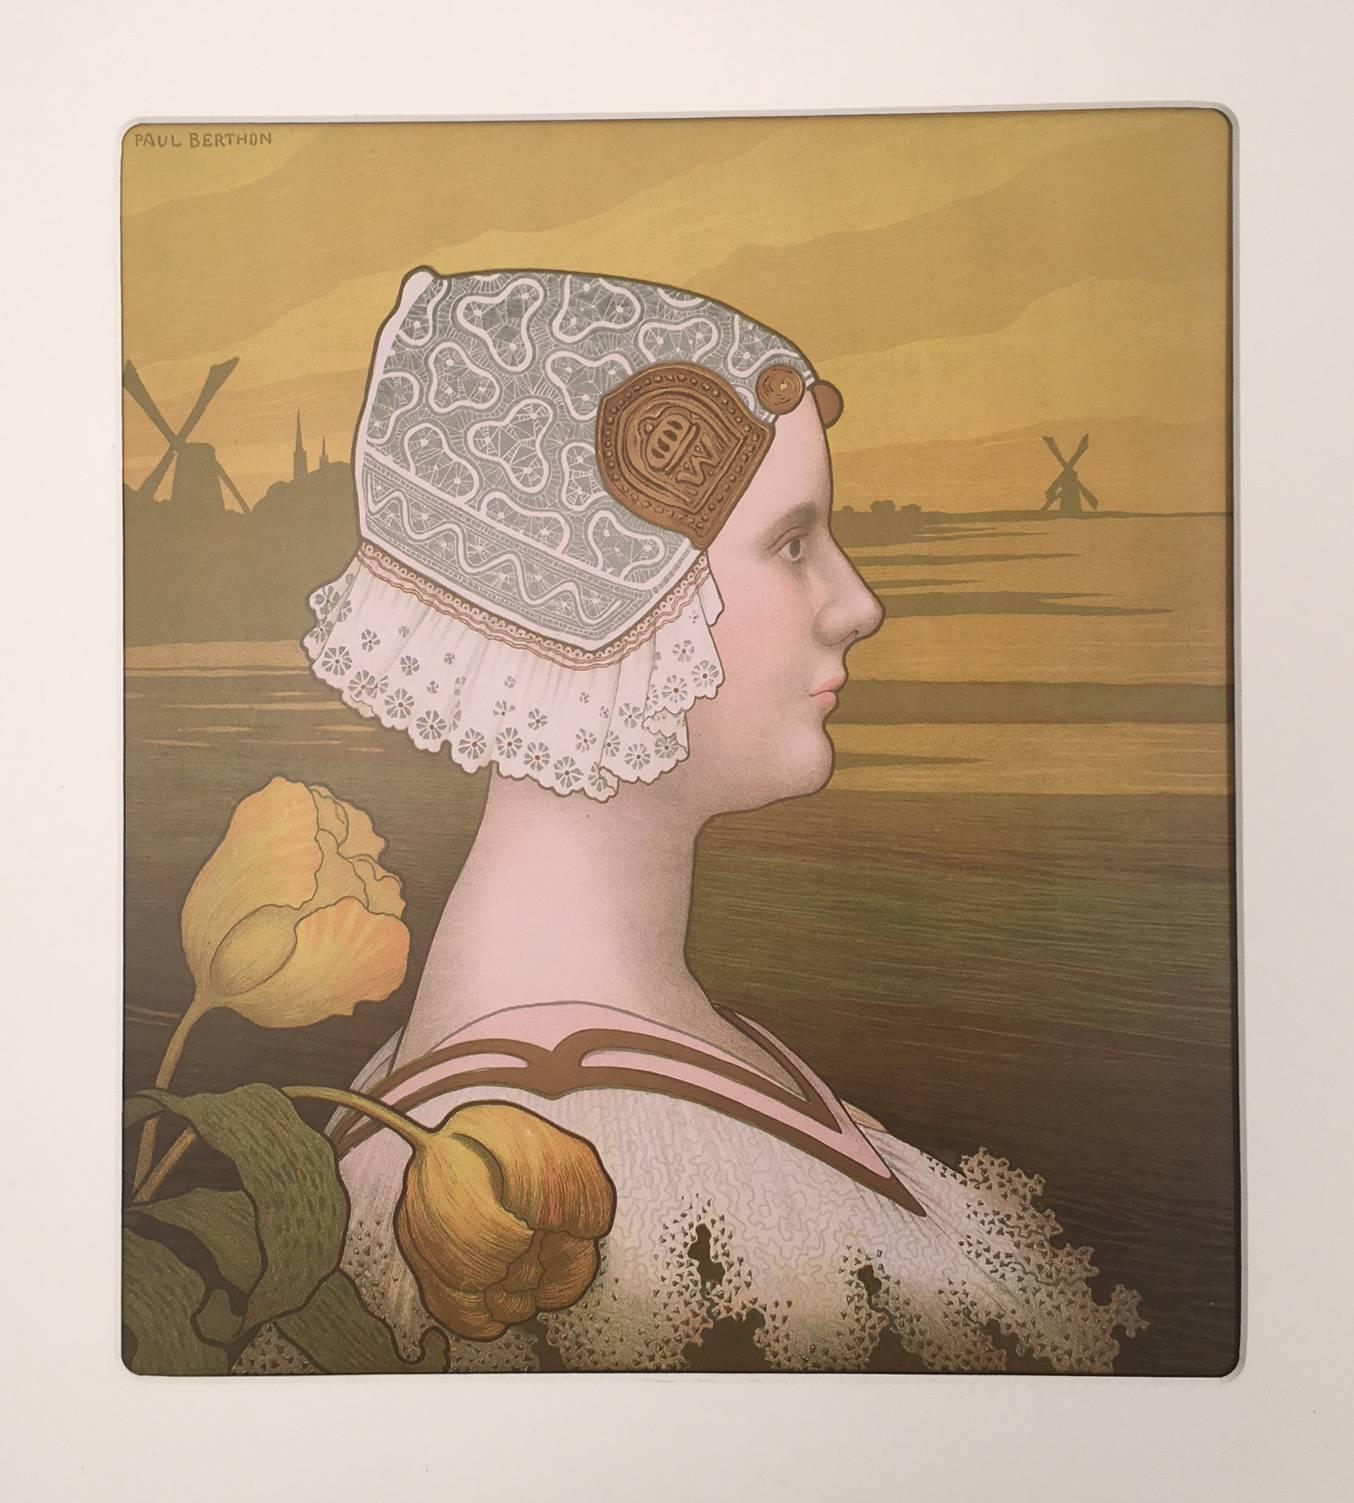 Lithograph - Paul Berthon 1901